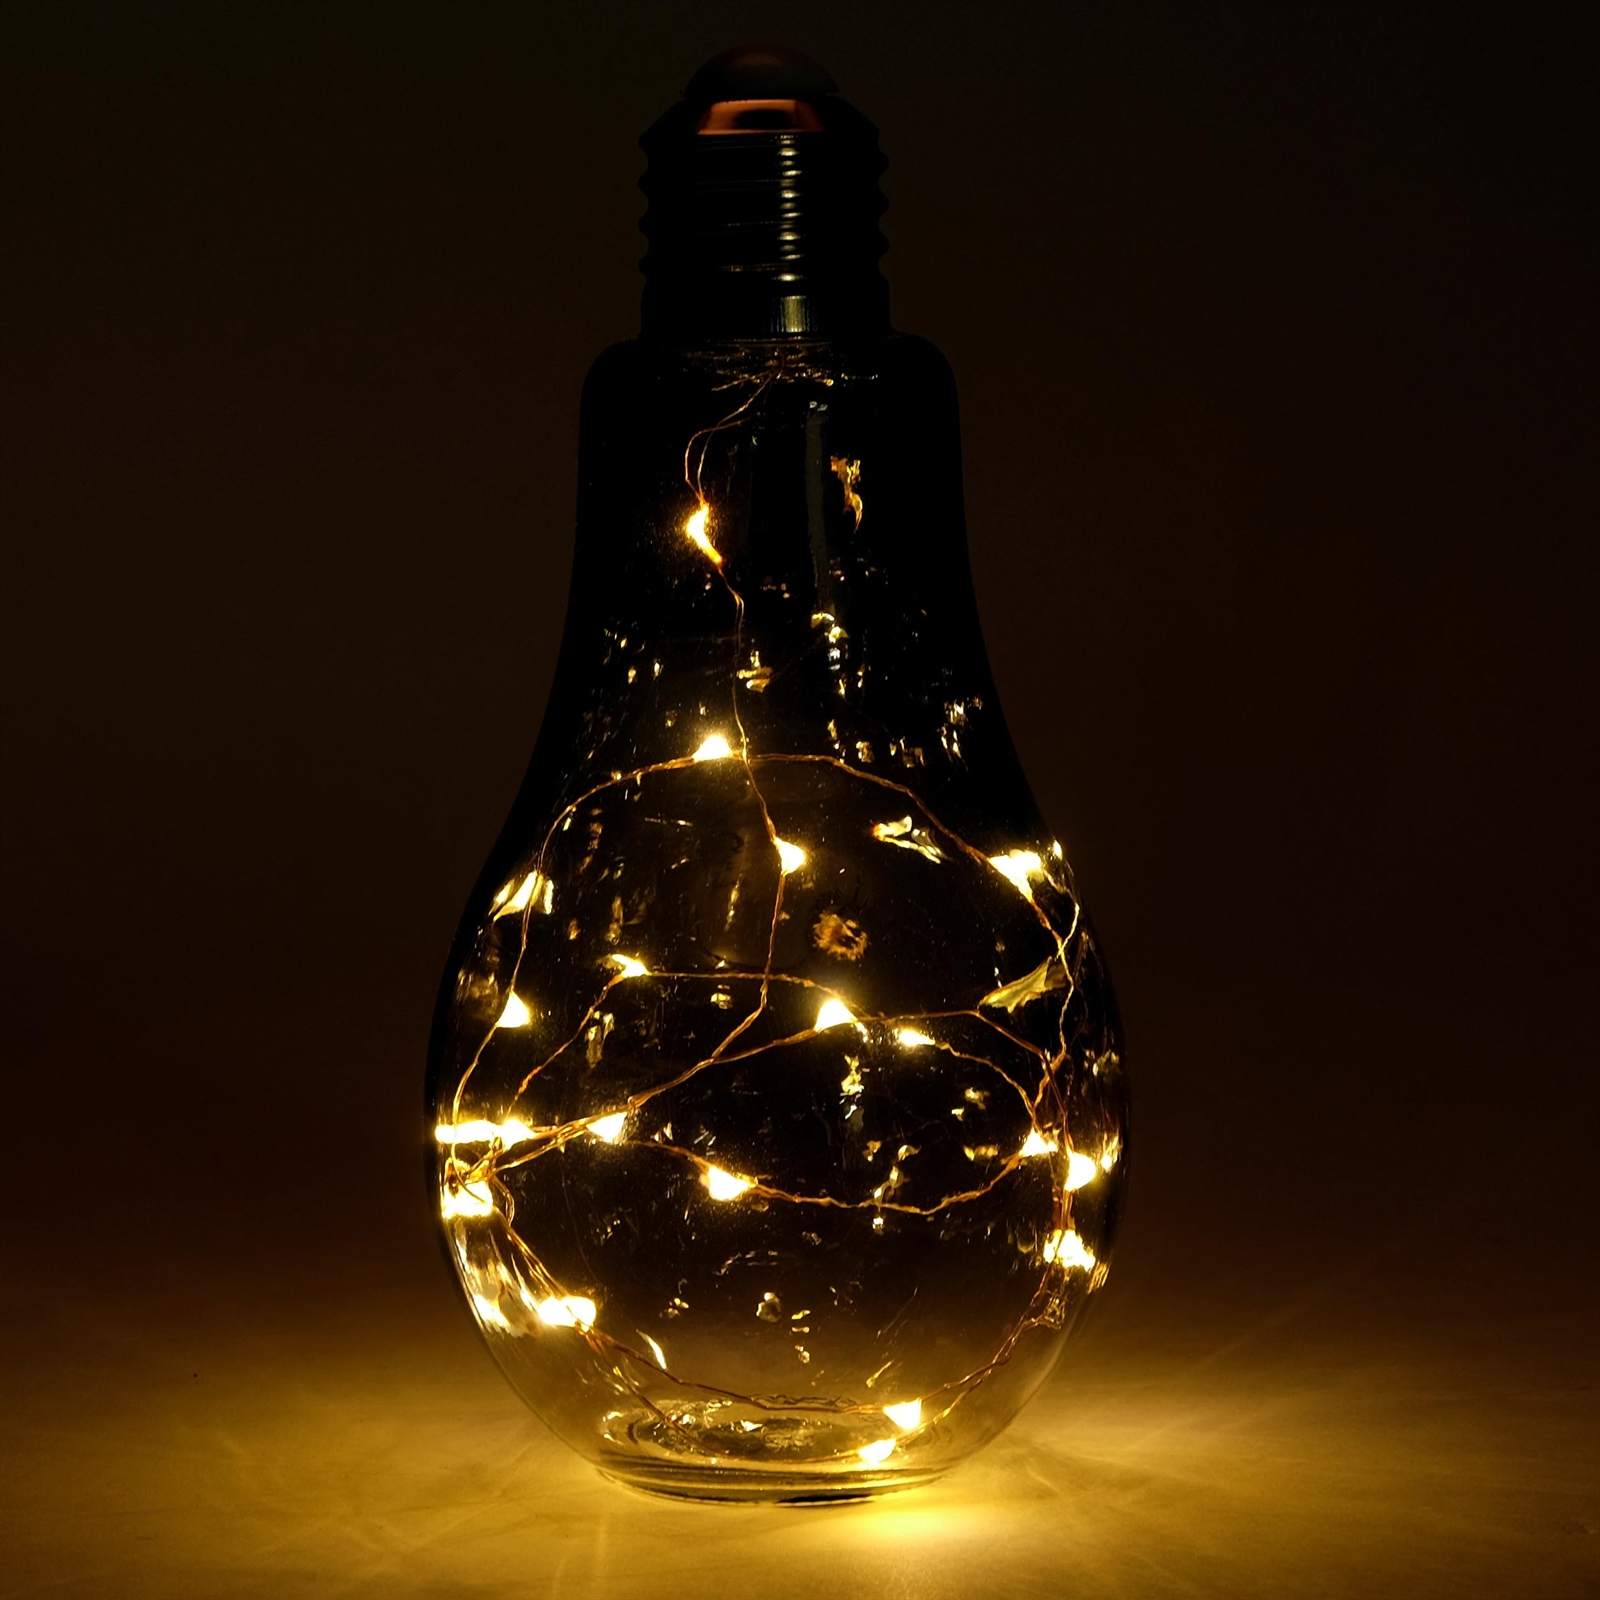 originelle deko leuchte solo glas 19 led rauchgrau gl hbirne dekolampe ebay. Black Bedroom Furniture Sets. Home Design Ideas